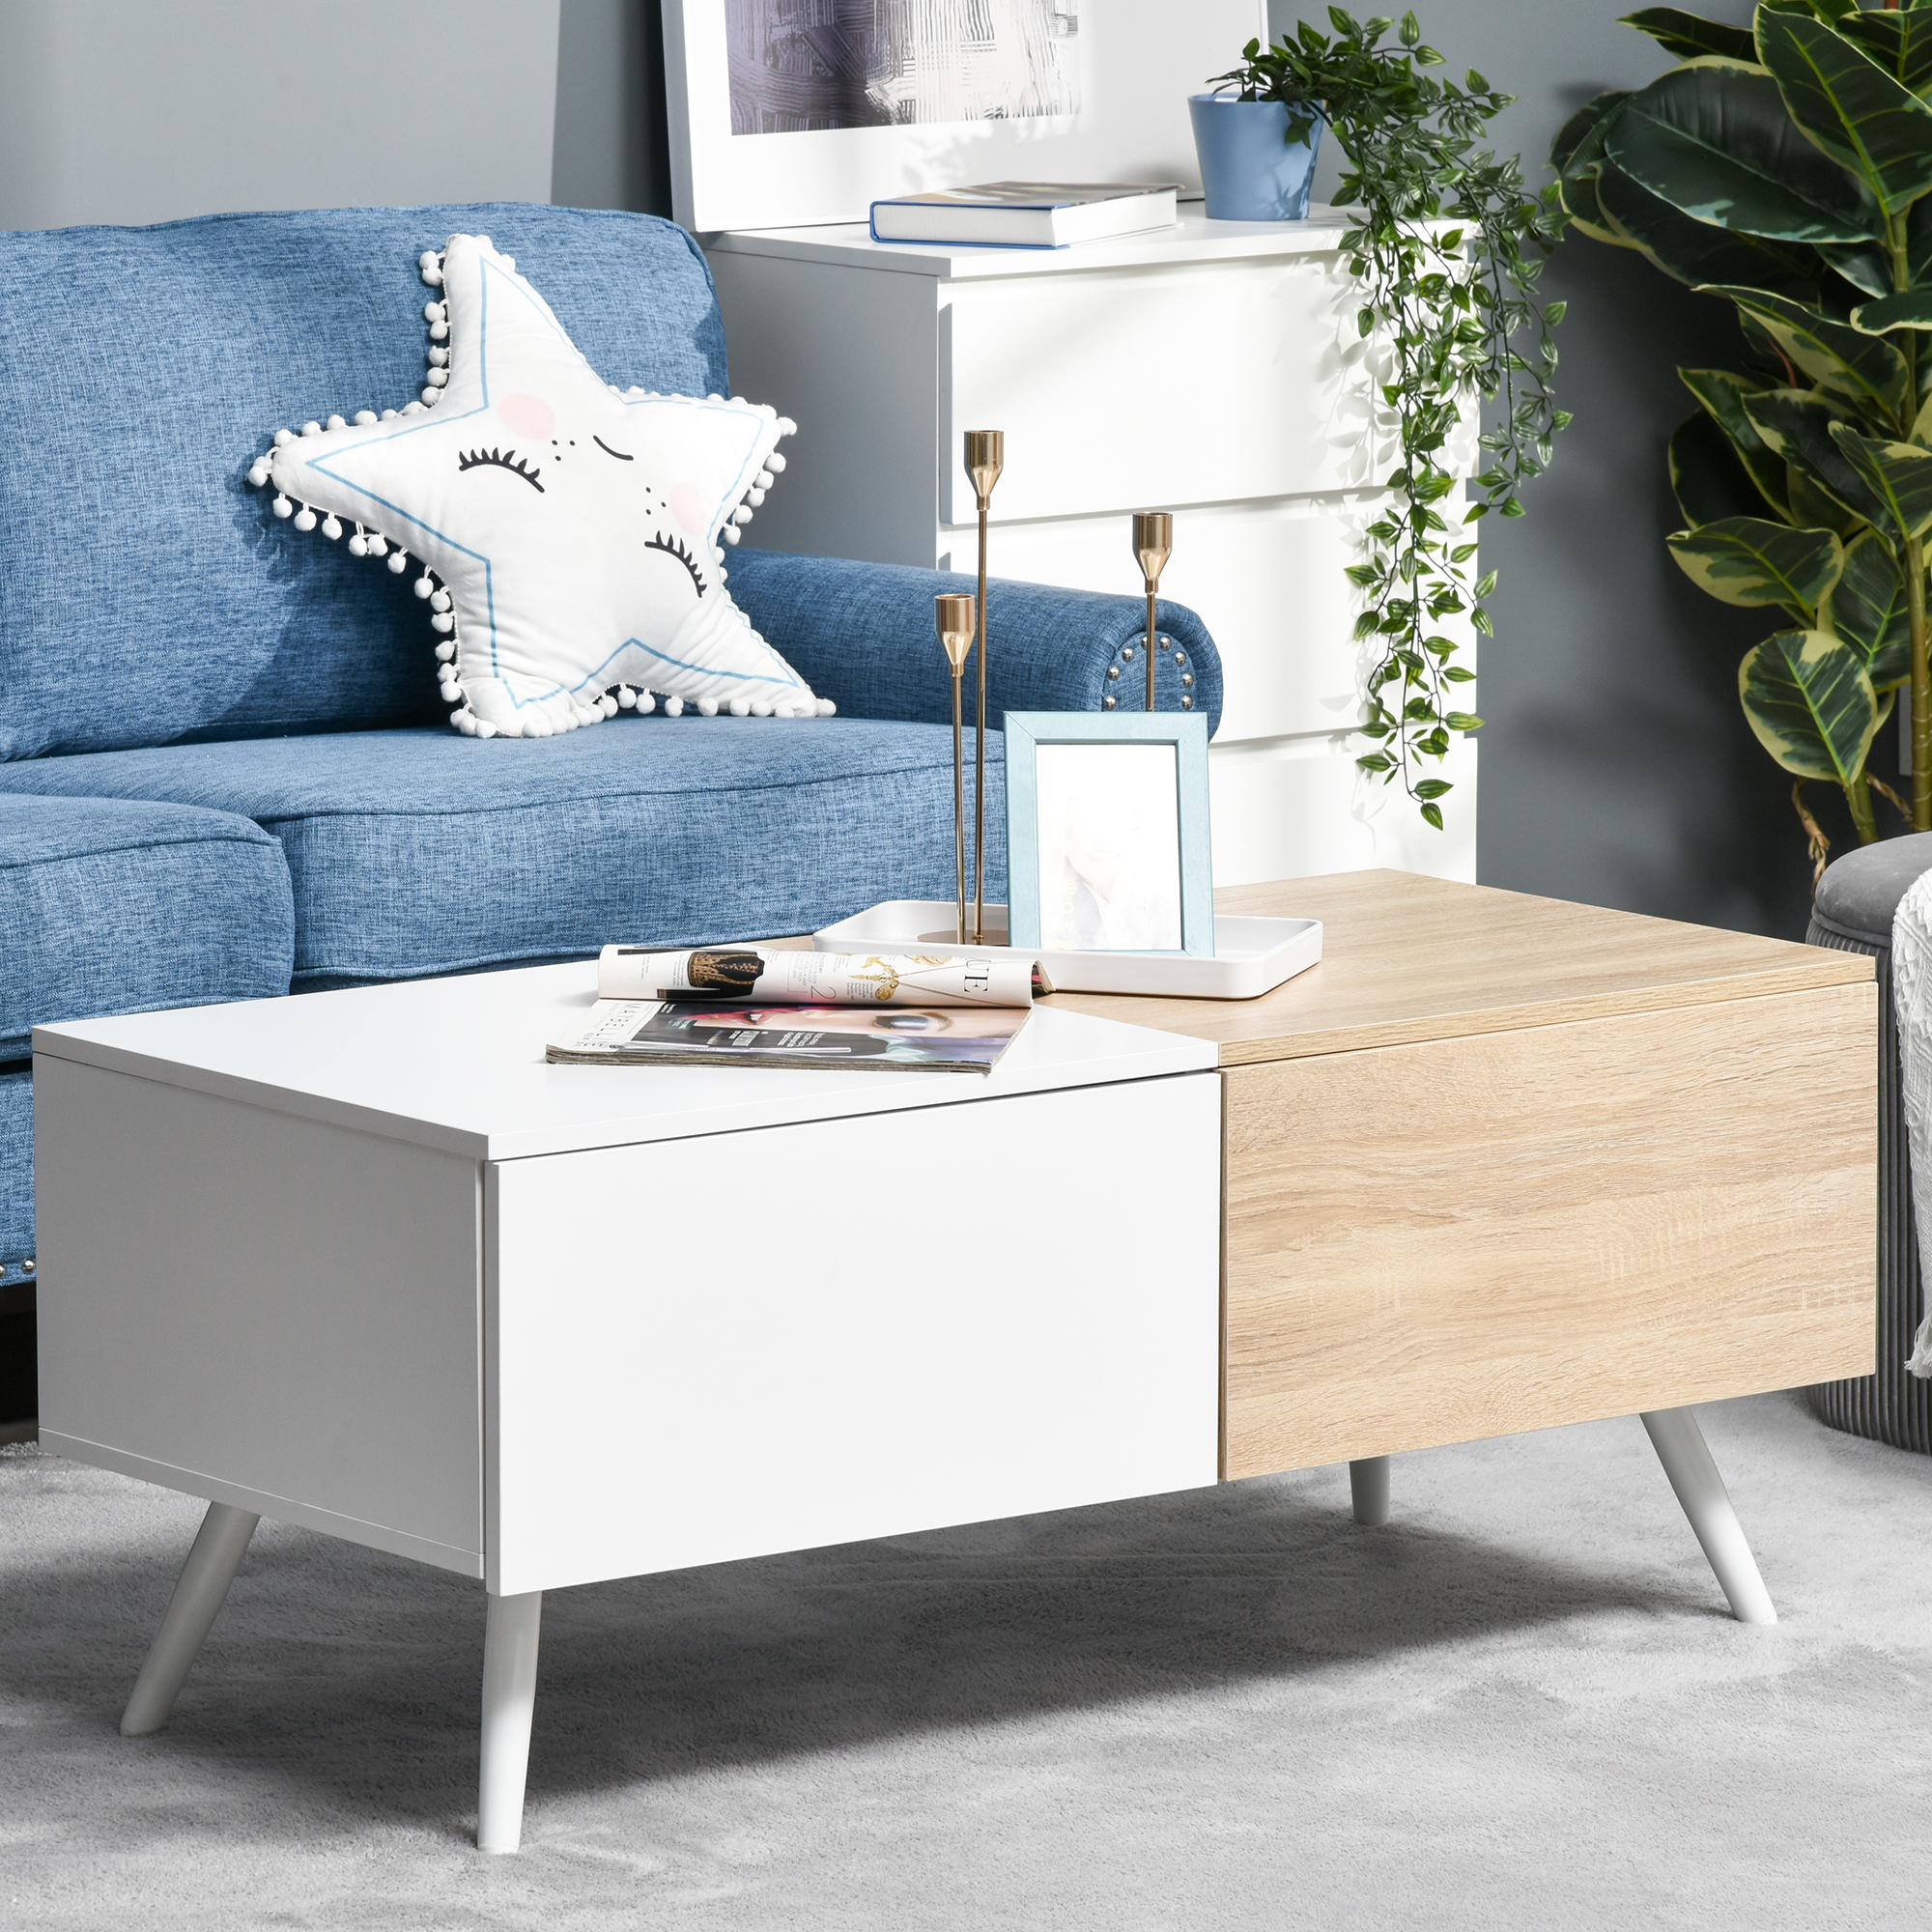 Table basse rectangulaire 2 tiroirs métal MDF blanc bois clair